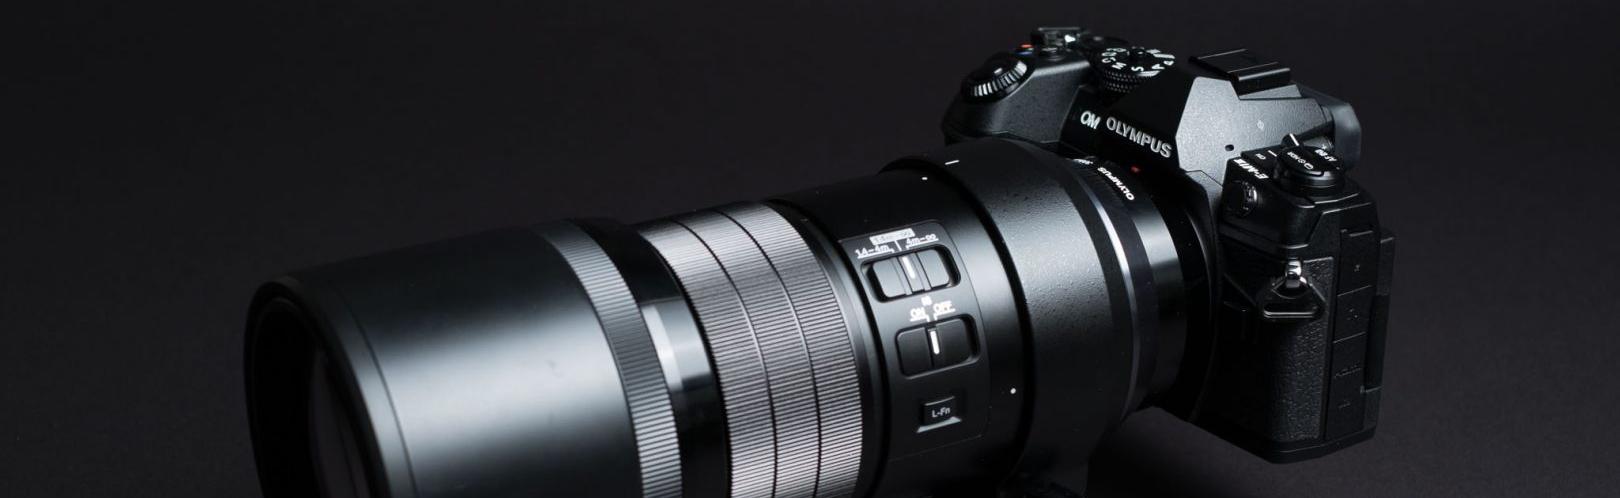 Olympus-OM-D-E-M1-Mark-II-Product-7-e1547072471203.jpg